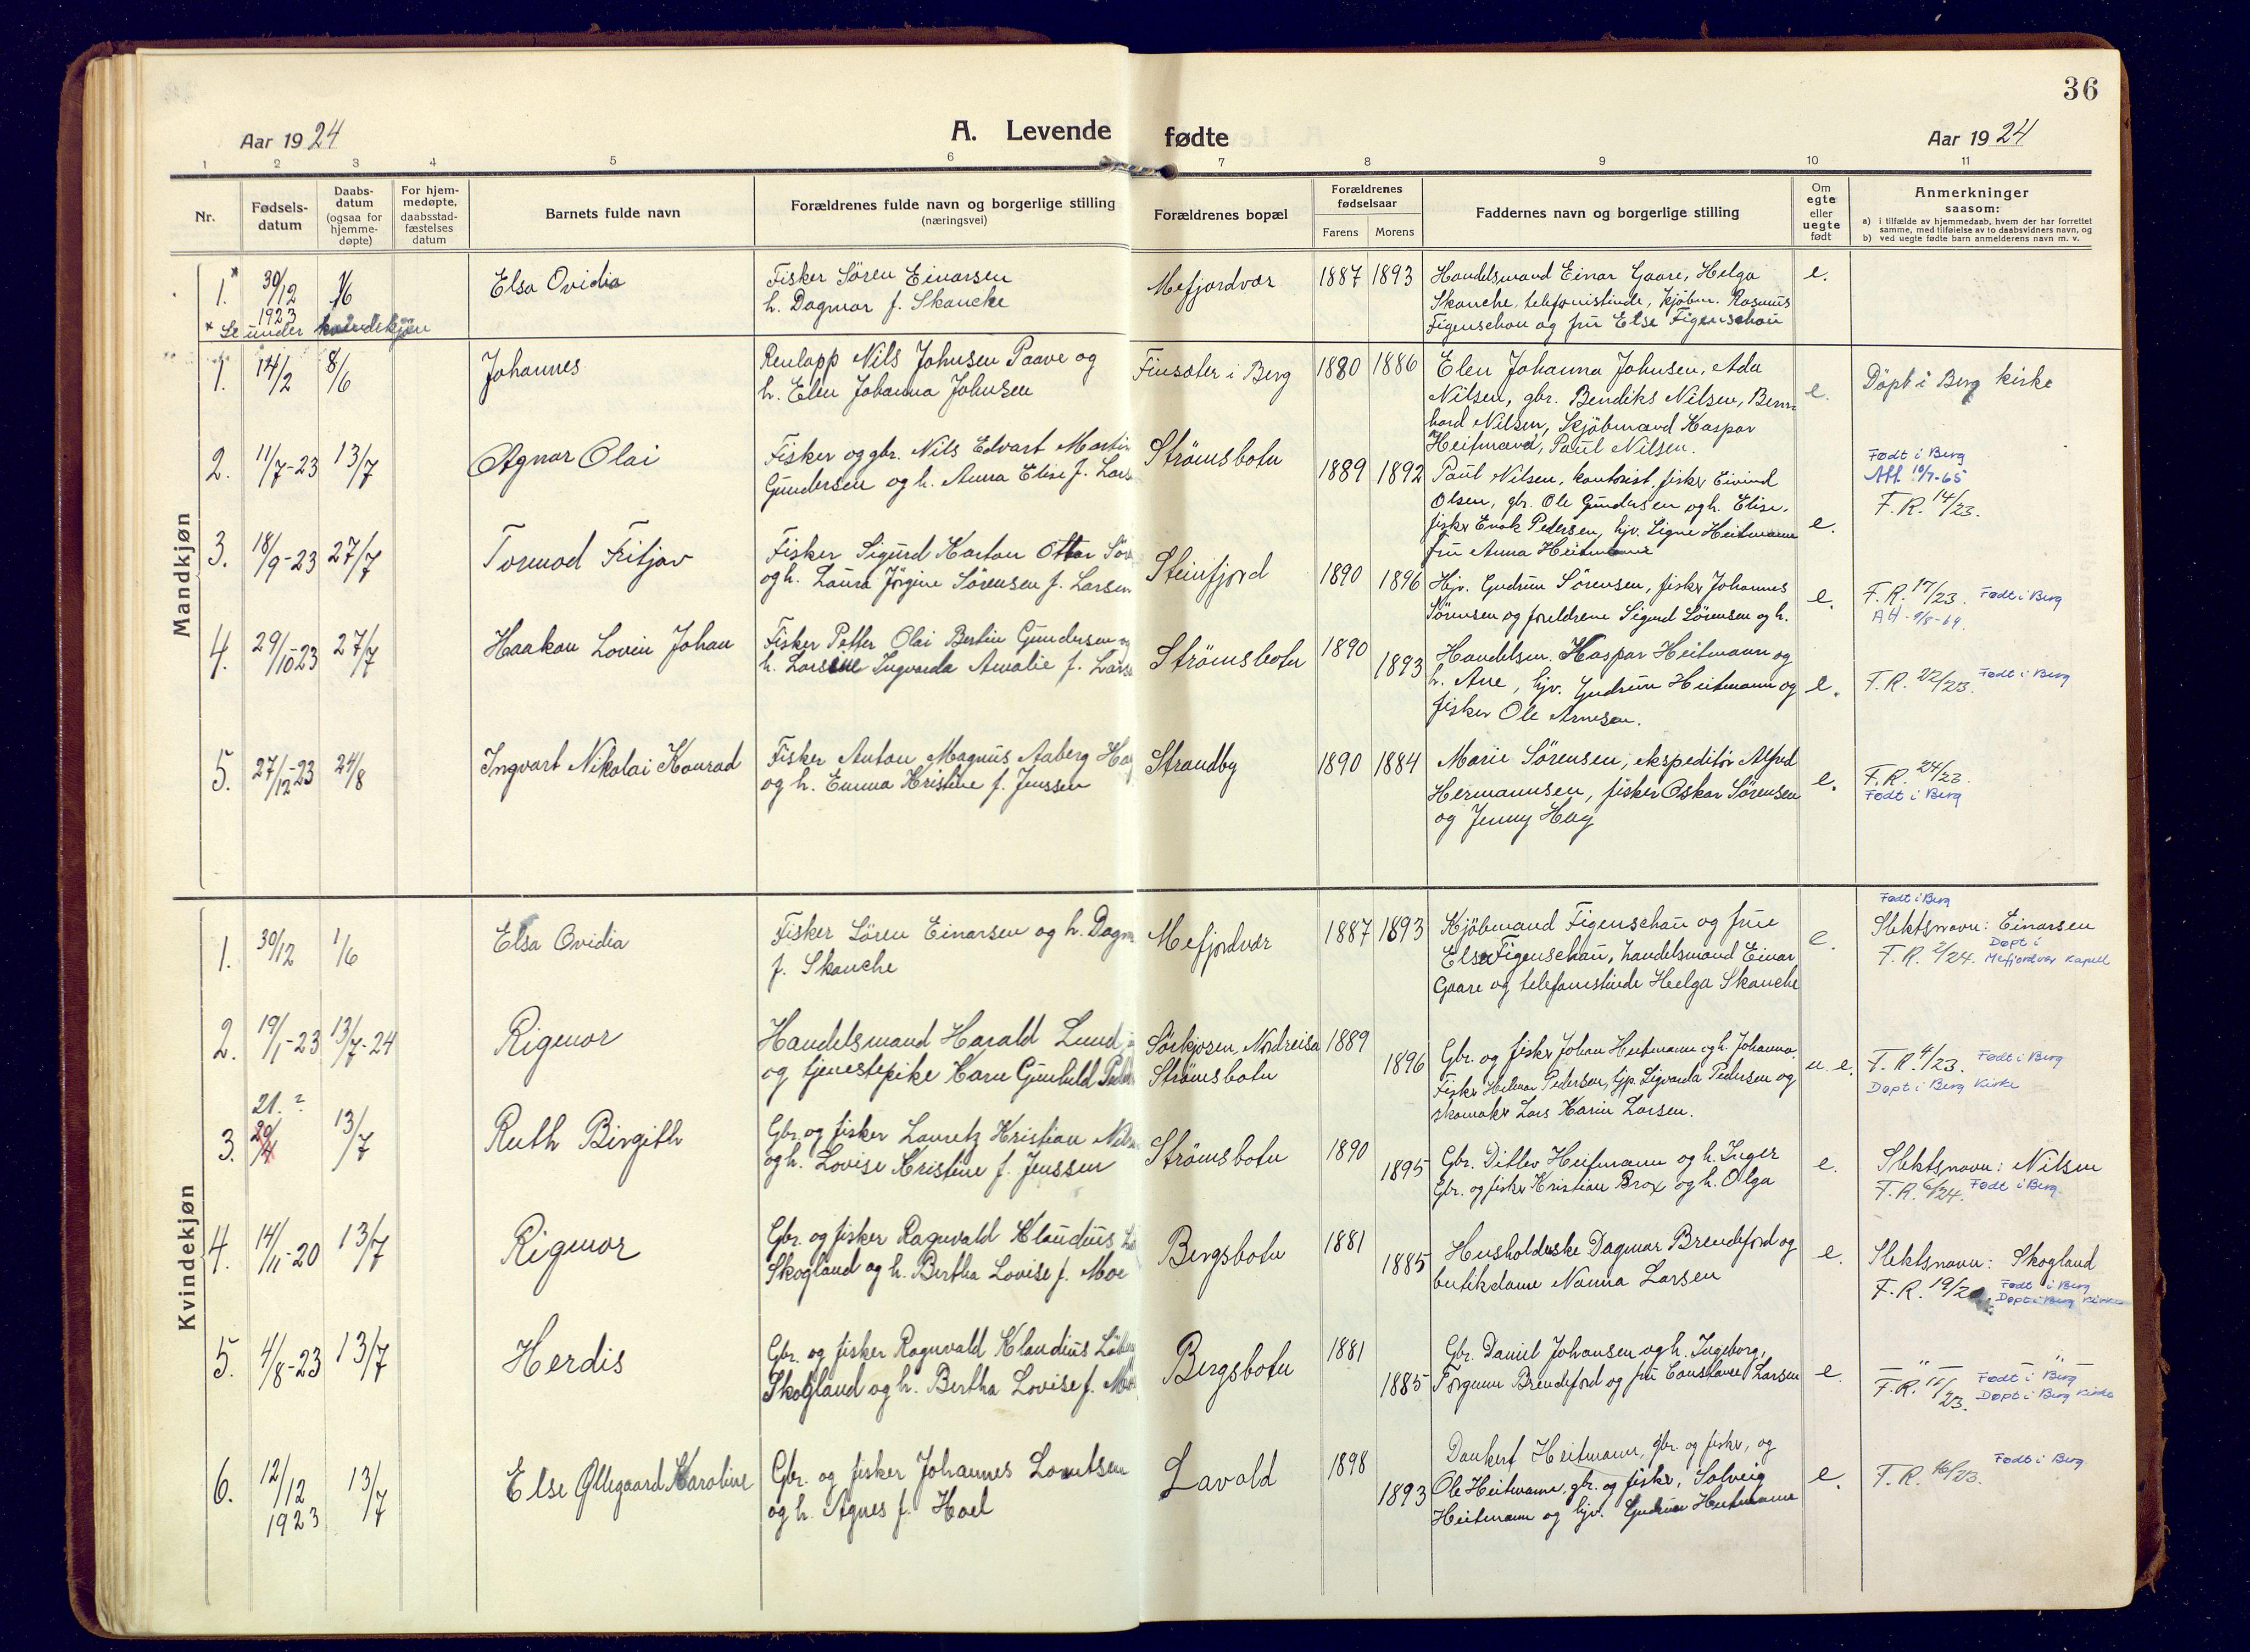 SATØ, Mefjord/Berg sokneprestkontor, G/Ga/Gaa: Ministerialbok nr. 9, 1916-1928, s. 36